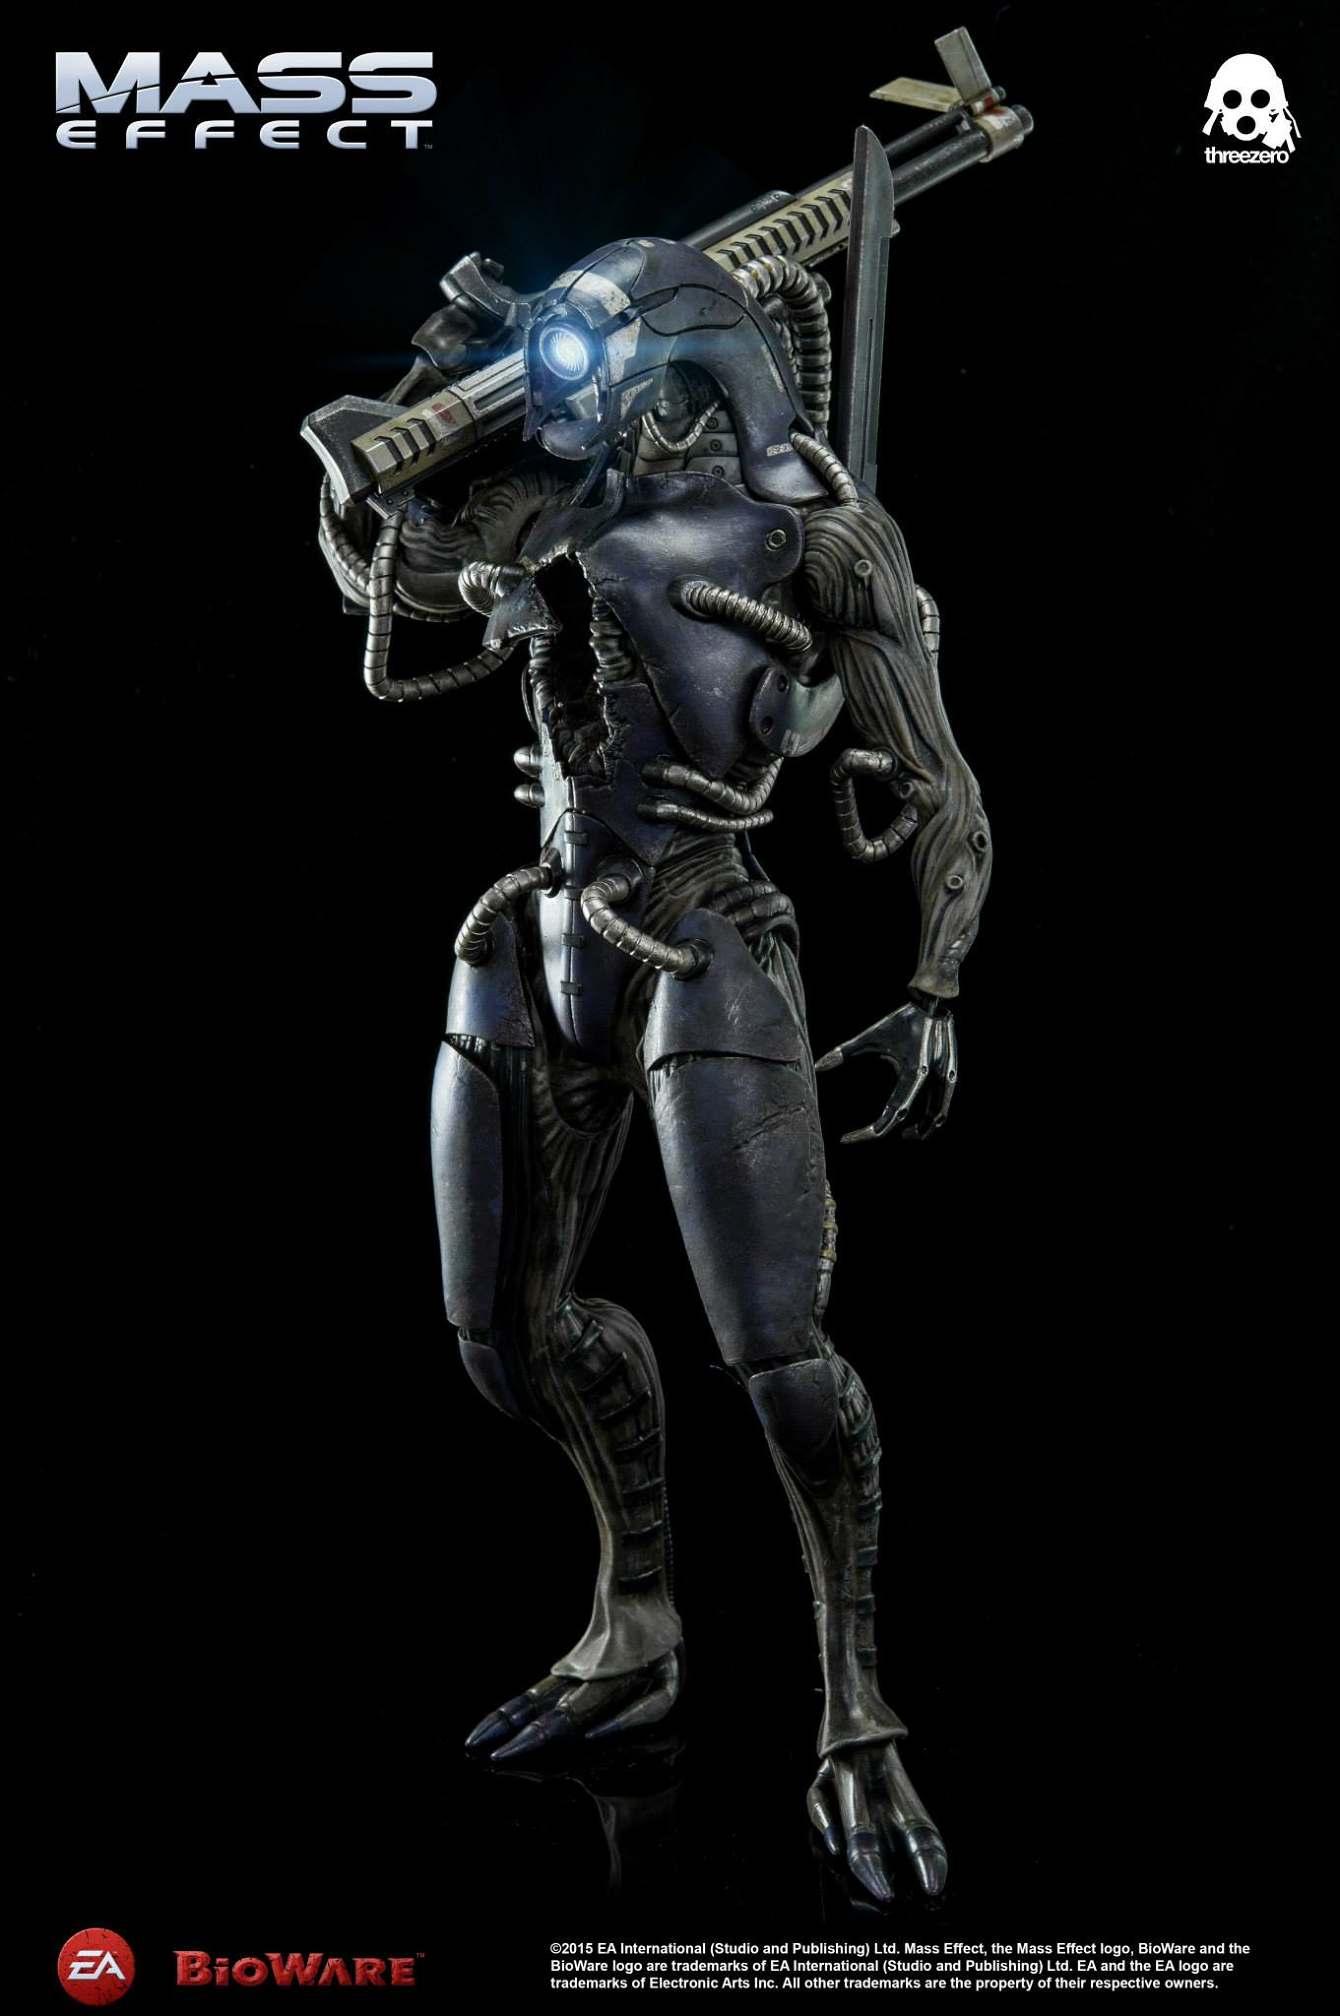 ThreeZero-Bioware-video-game-Legion-Mass-Effect-figure-3_1340_c.jpg